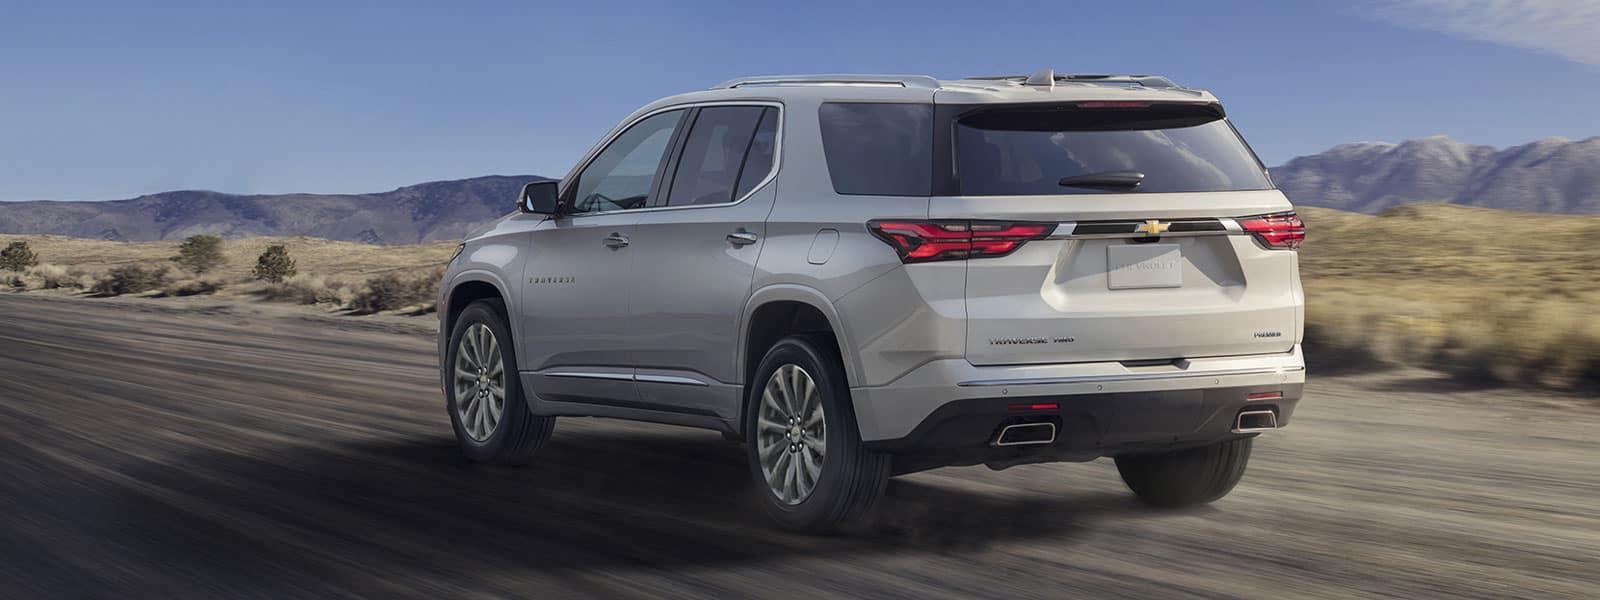 Lease or Finance new 2022 Chevrolet Traverse in Woodbirdge ON